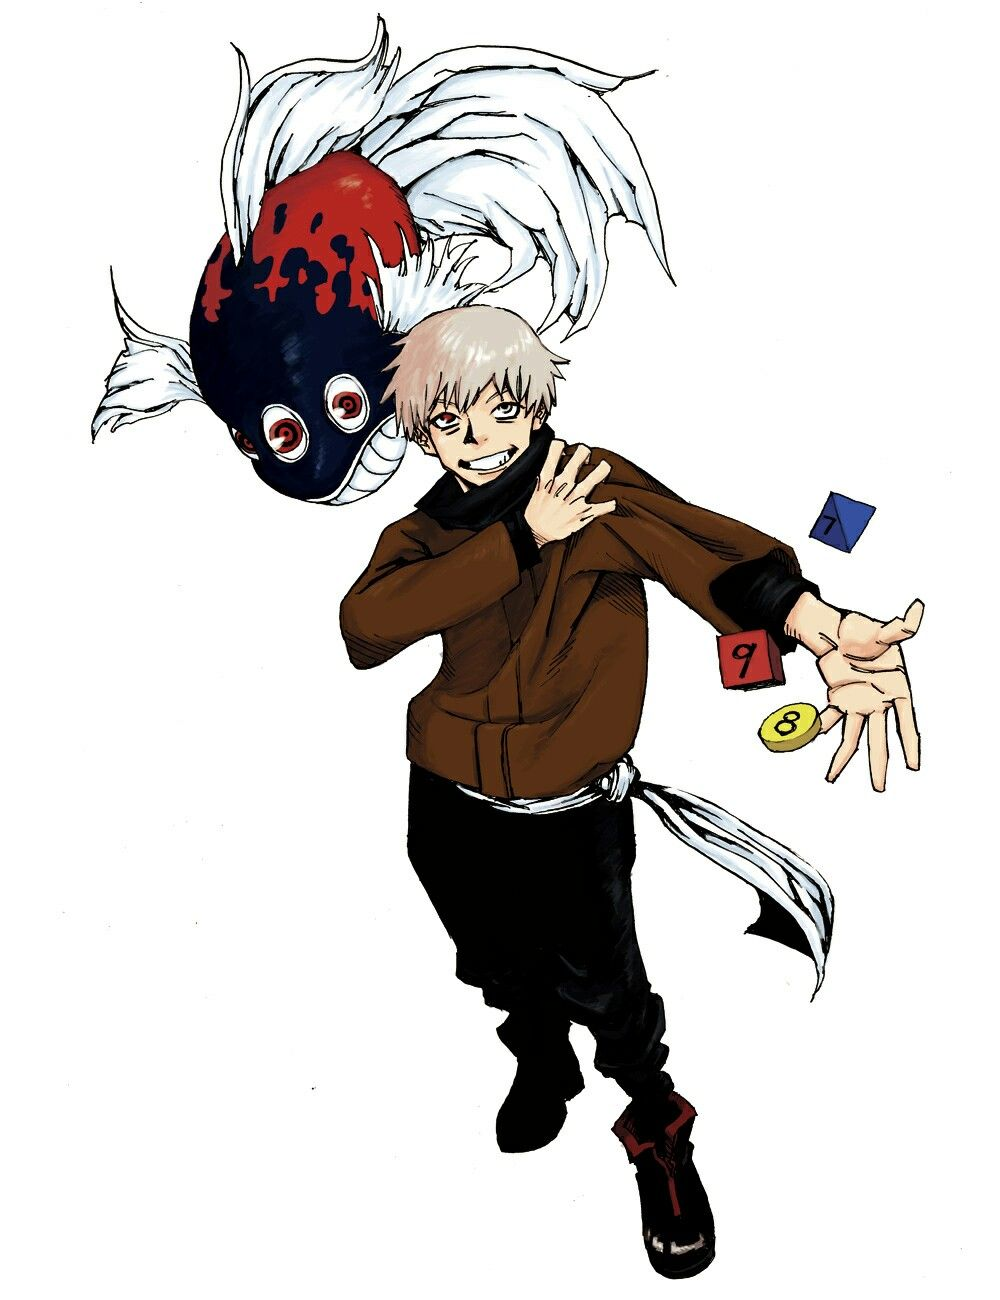 「No.9」 芥見下々 > ジャンプNEXT!! 2015 vol.2 マンガアート, 呪術, アニメ